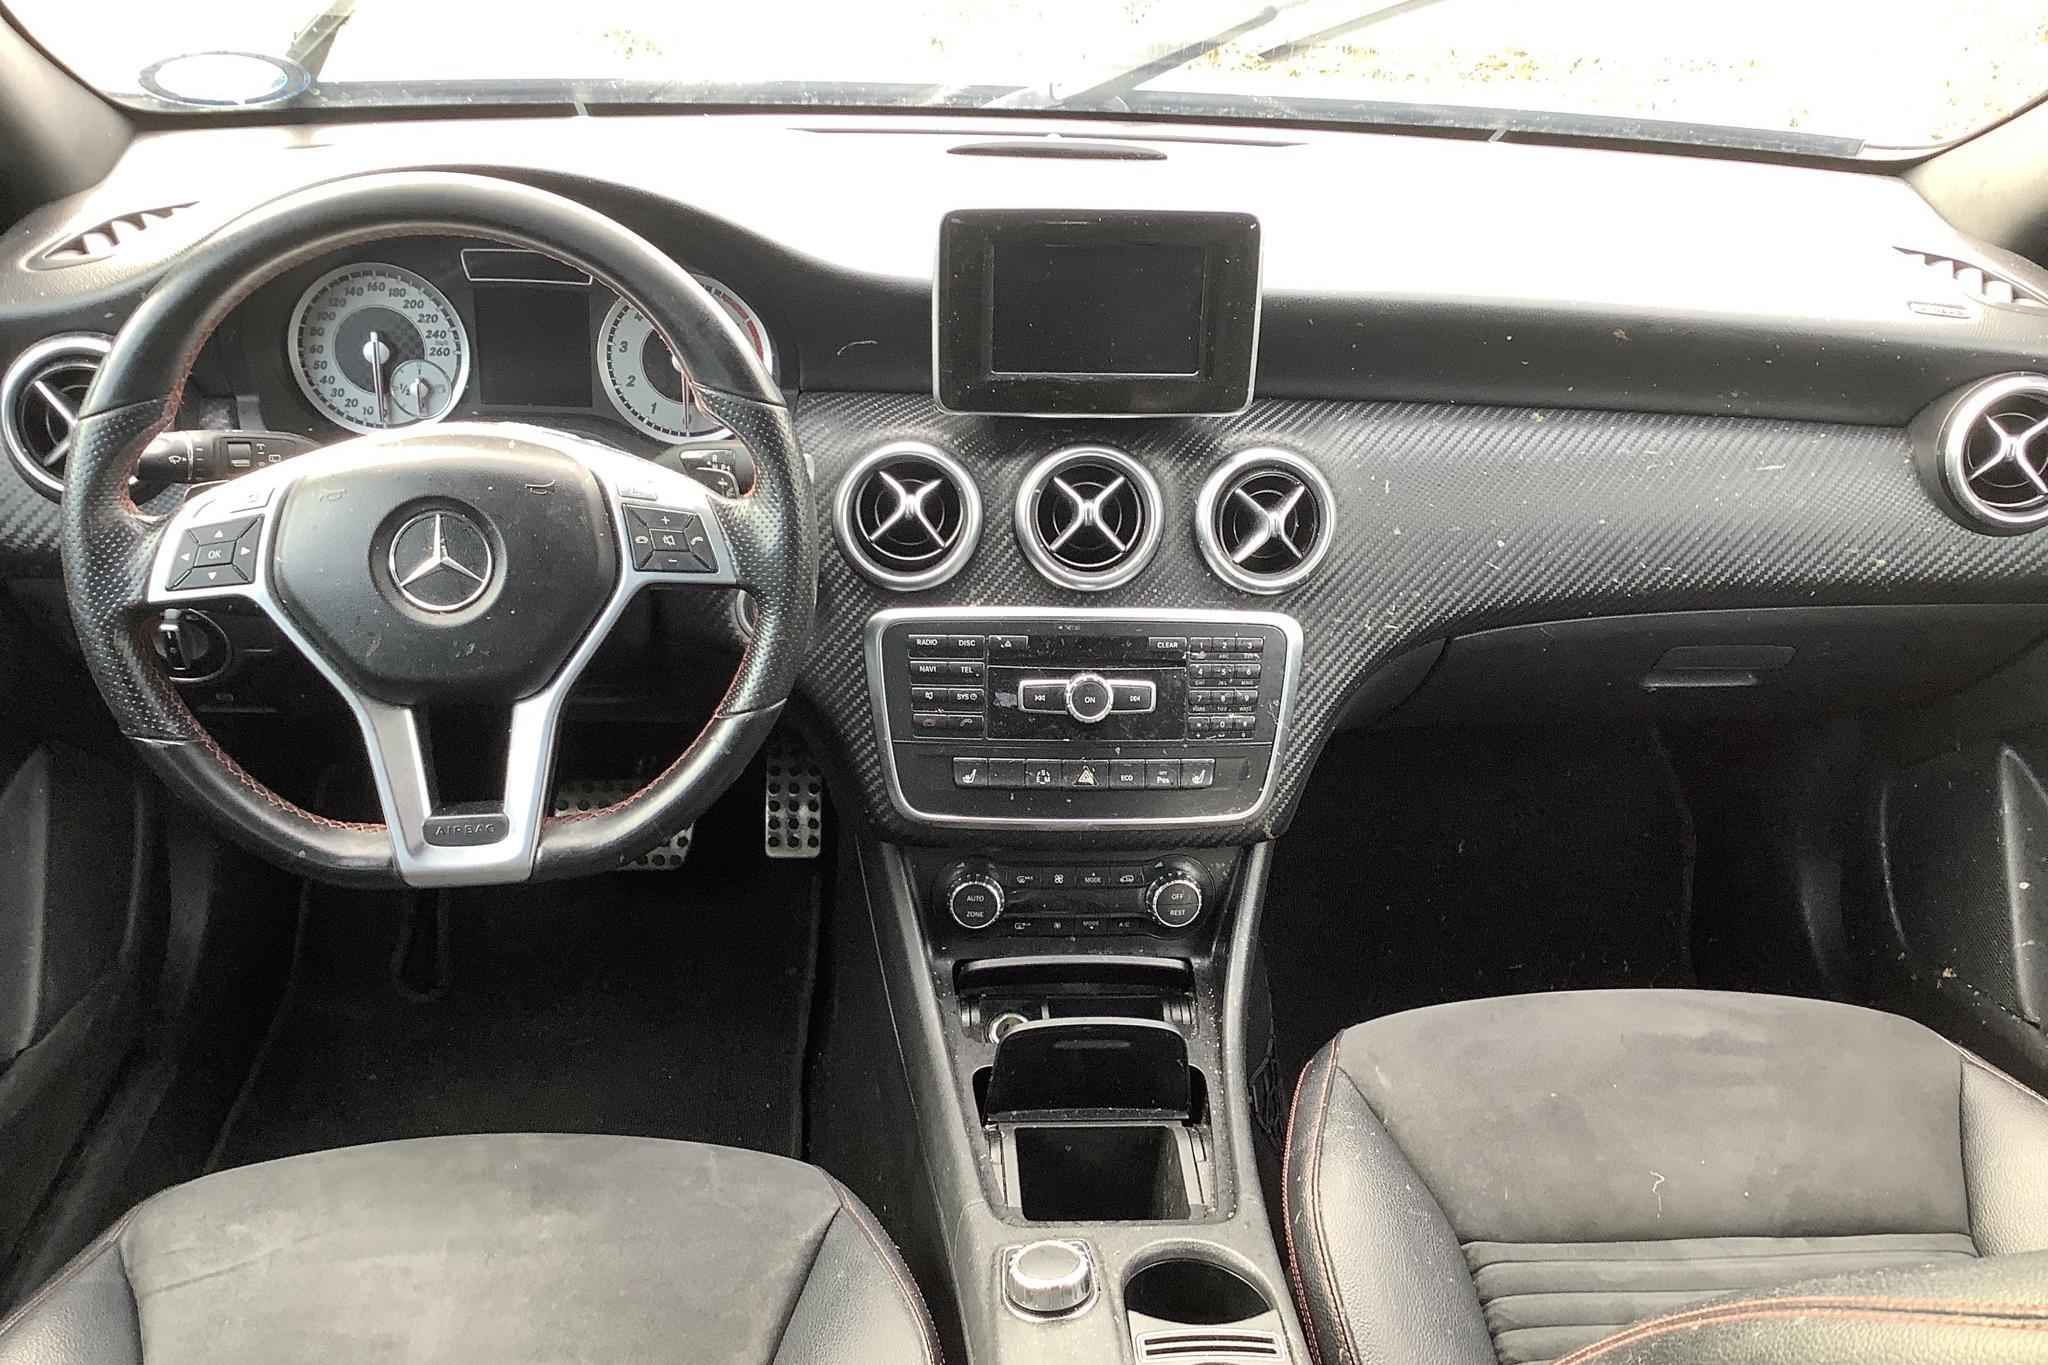 Mercedes A 200 5dr W176 (156hk) - 15 185 mil - Automat - Dark Blue - 2013